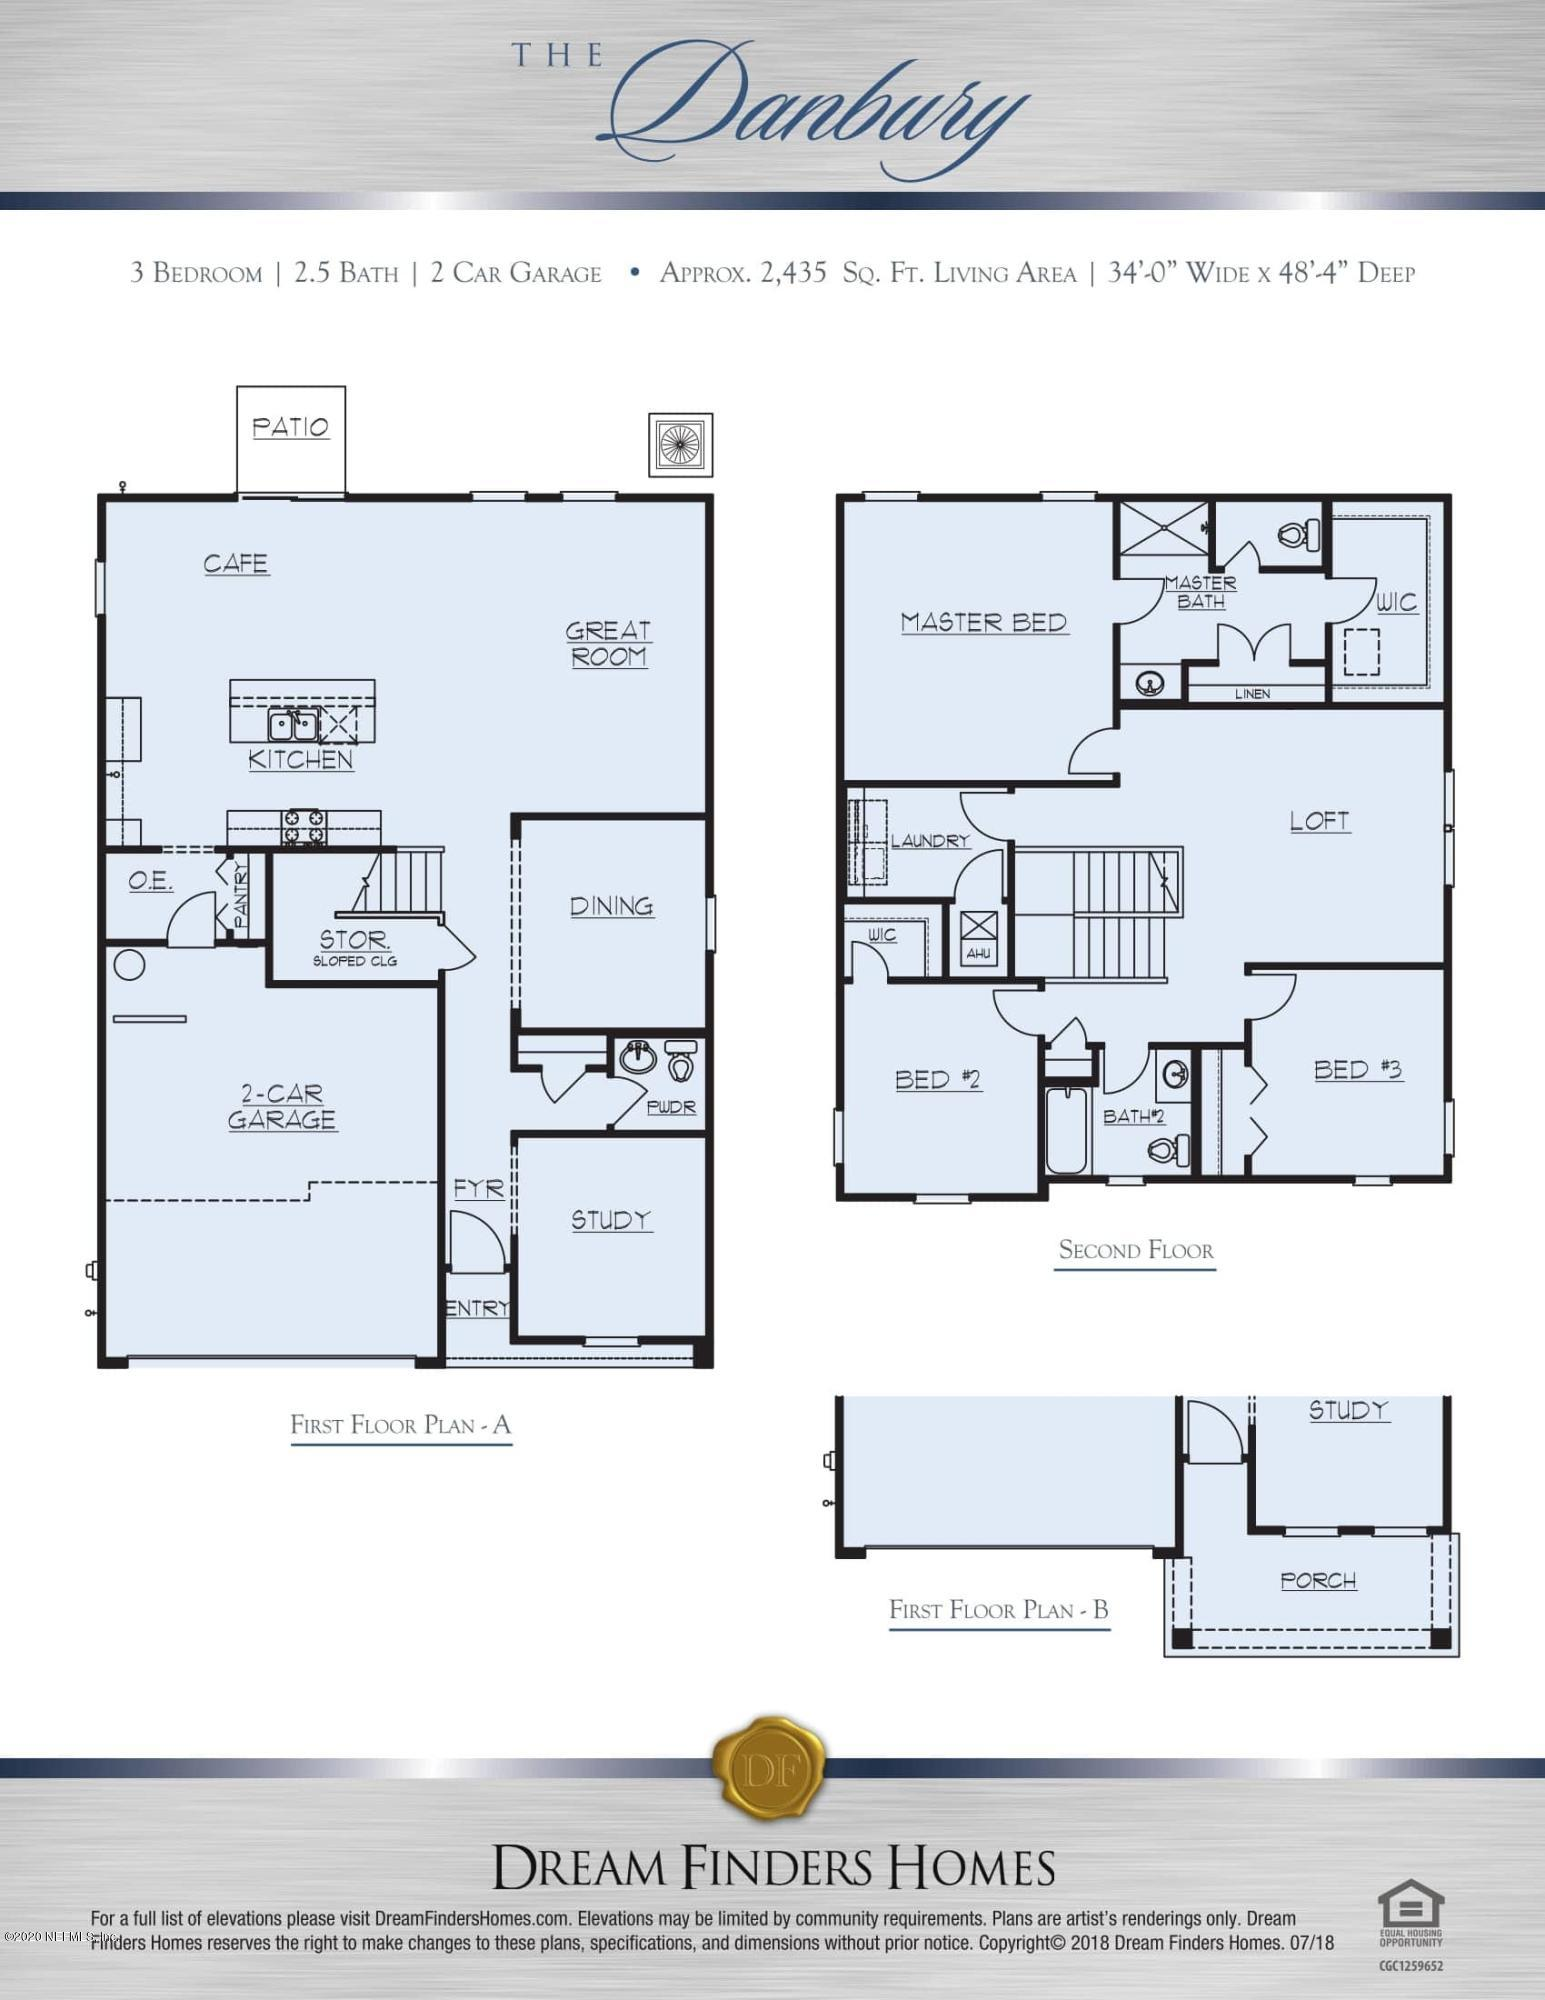 3013 HANGING VALLEY, ORANGE PARK, FLORIDA 32065, 4 Bedrooms Bedrooms, ,2 BathroomsBathrooms,Residential,For sale,HANGING VALLEY,1079912